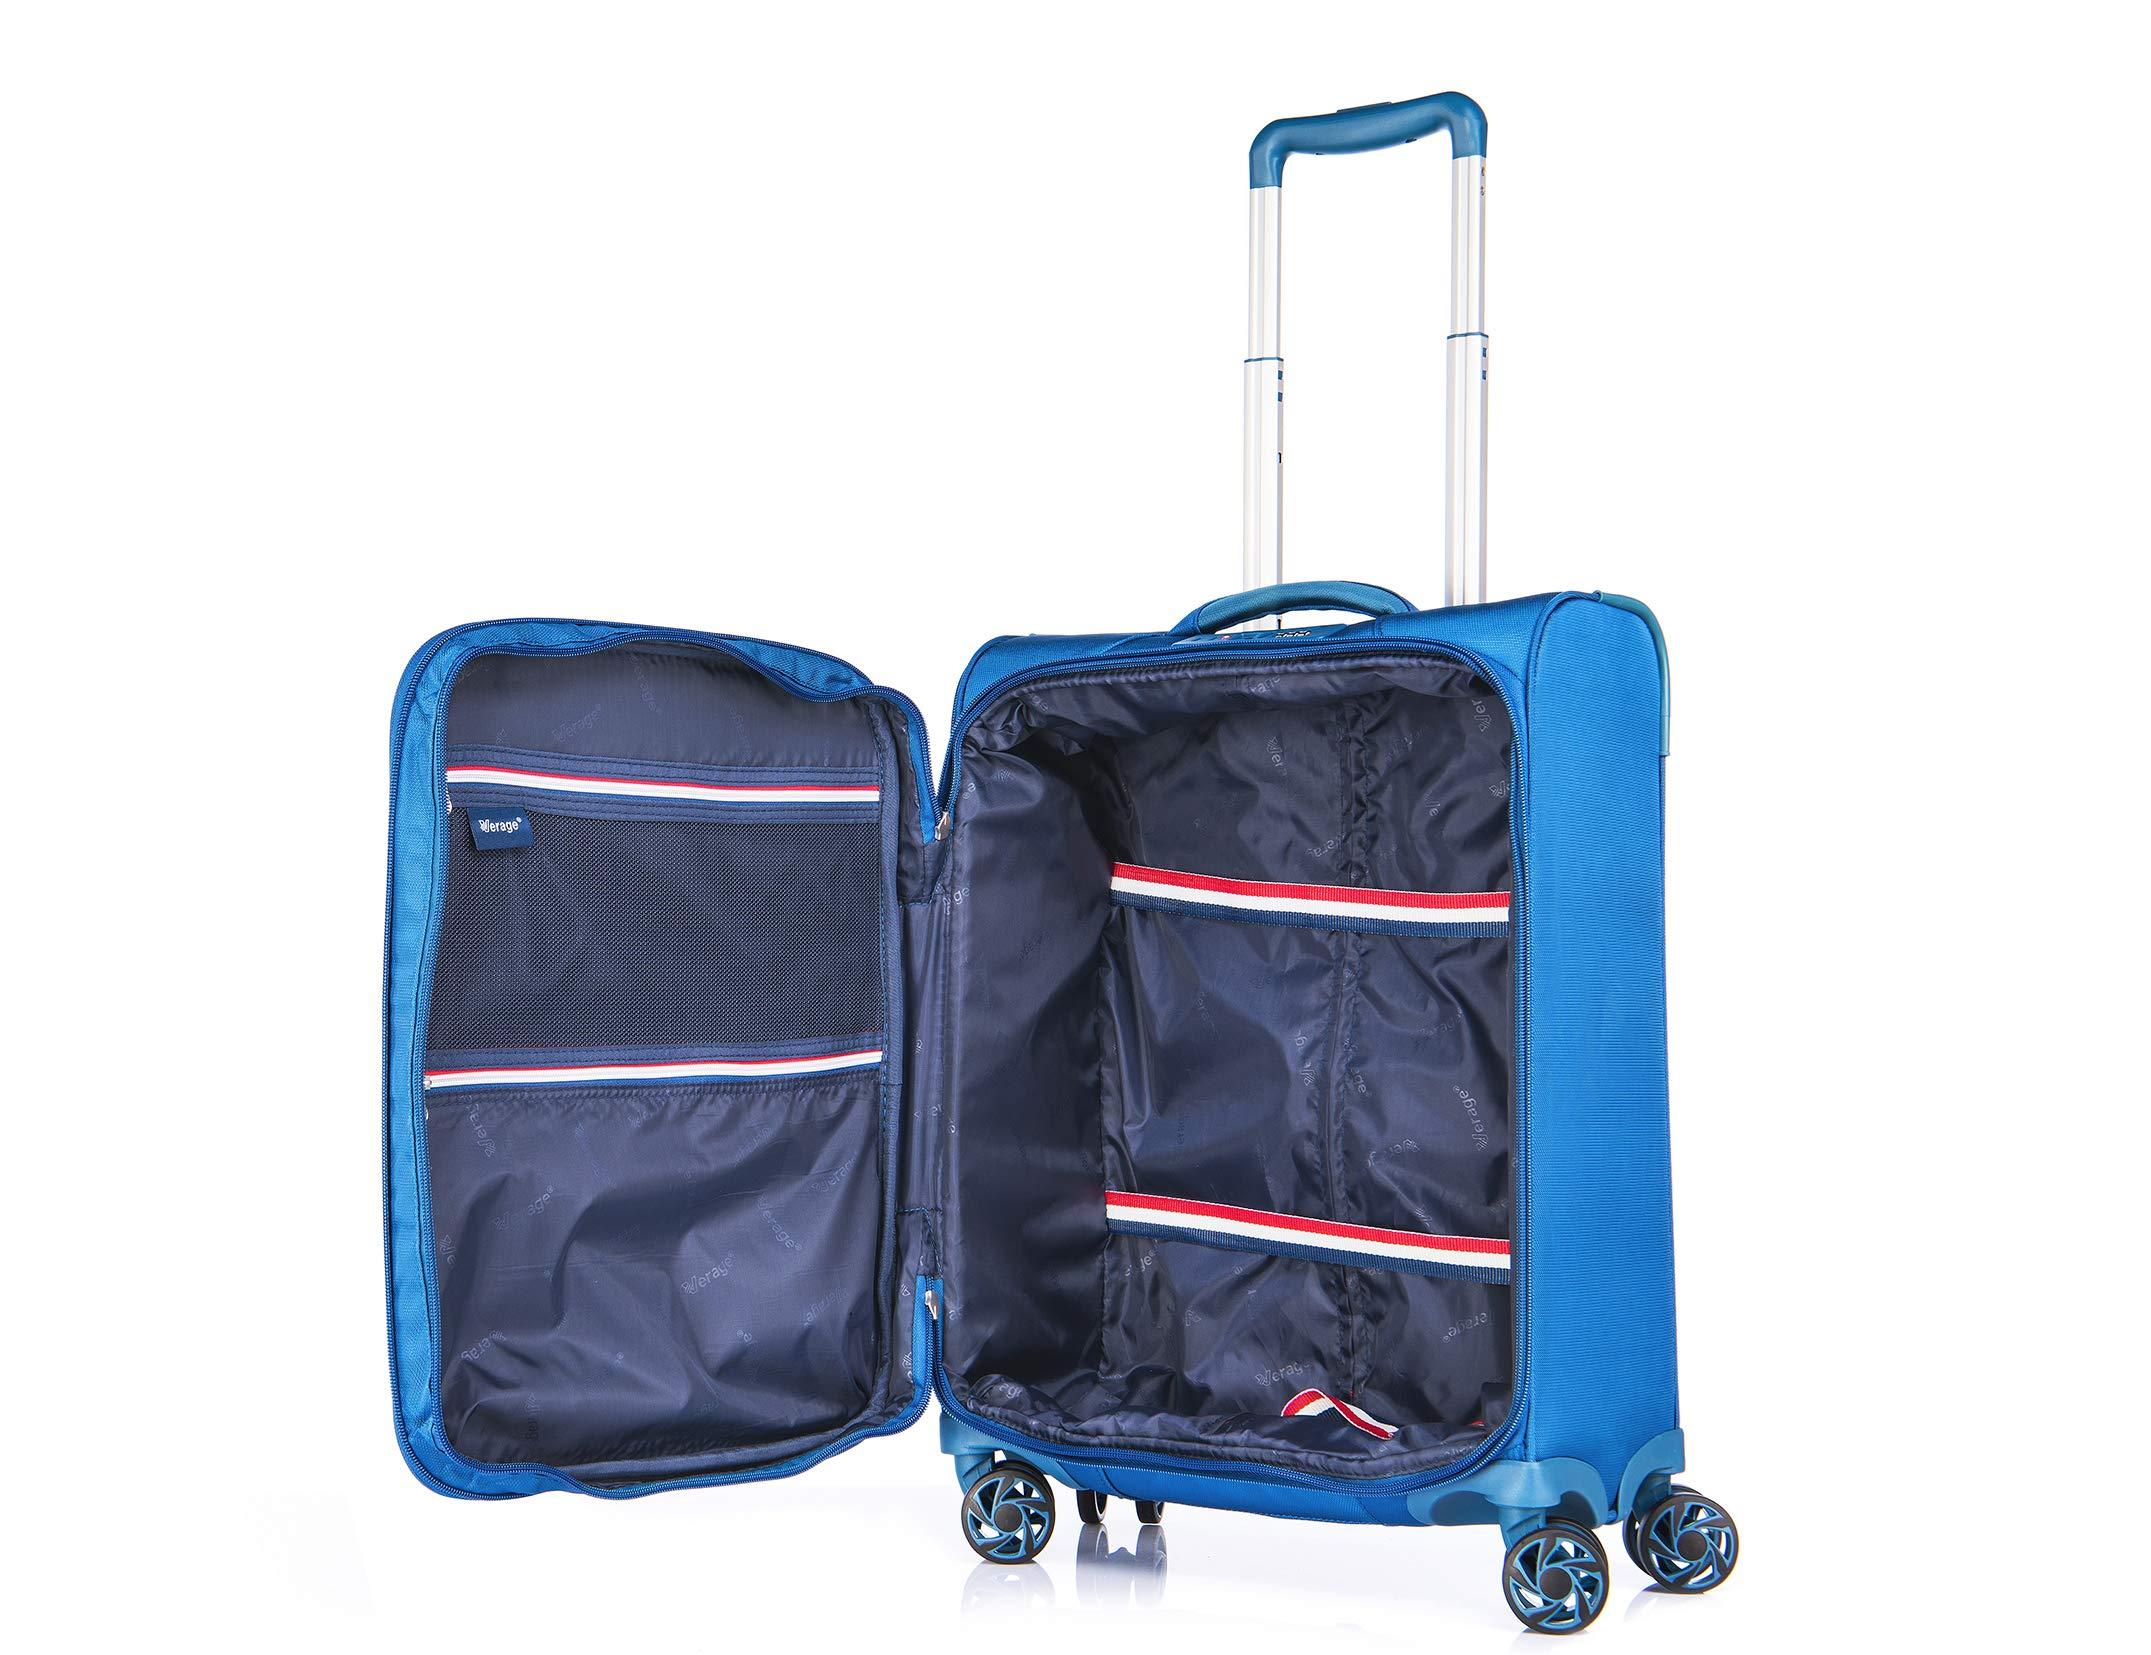 Verage-Visionary-4-Rollen-Stoff-Reisekoffer-Handgepck-Business-Trolley-Set-S-M-L-Rot-Schwarz-Lila-Blau-Petrol-wasserdicht-TSA-integriert-erweiterbar